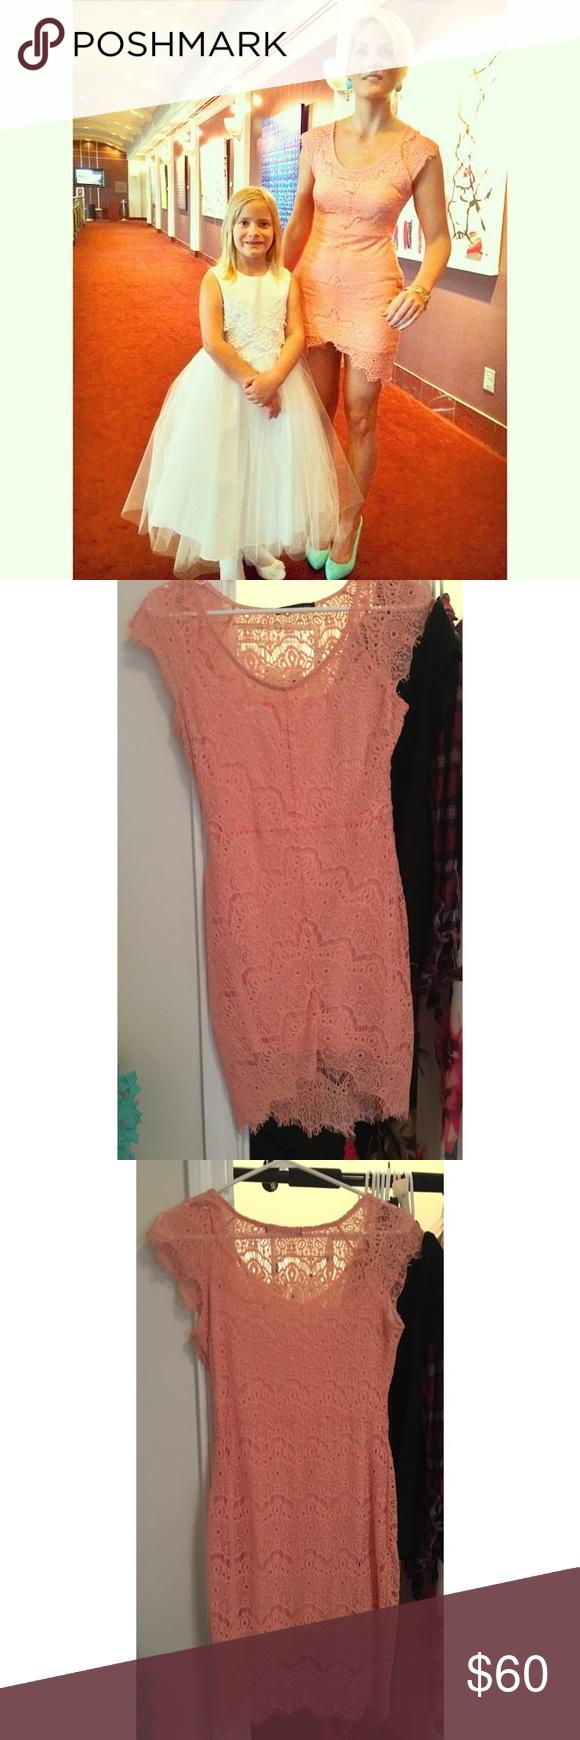 Lace dress pink  Light Coral Lace Dress  Coral lace dresses Coral lace and Lace dress